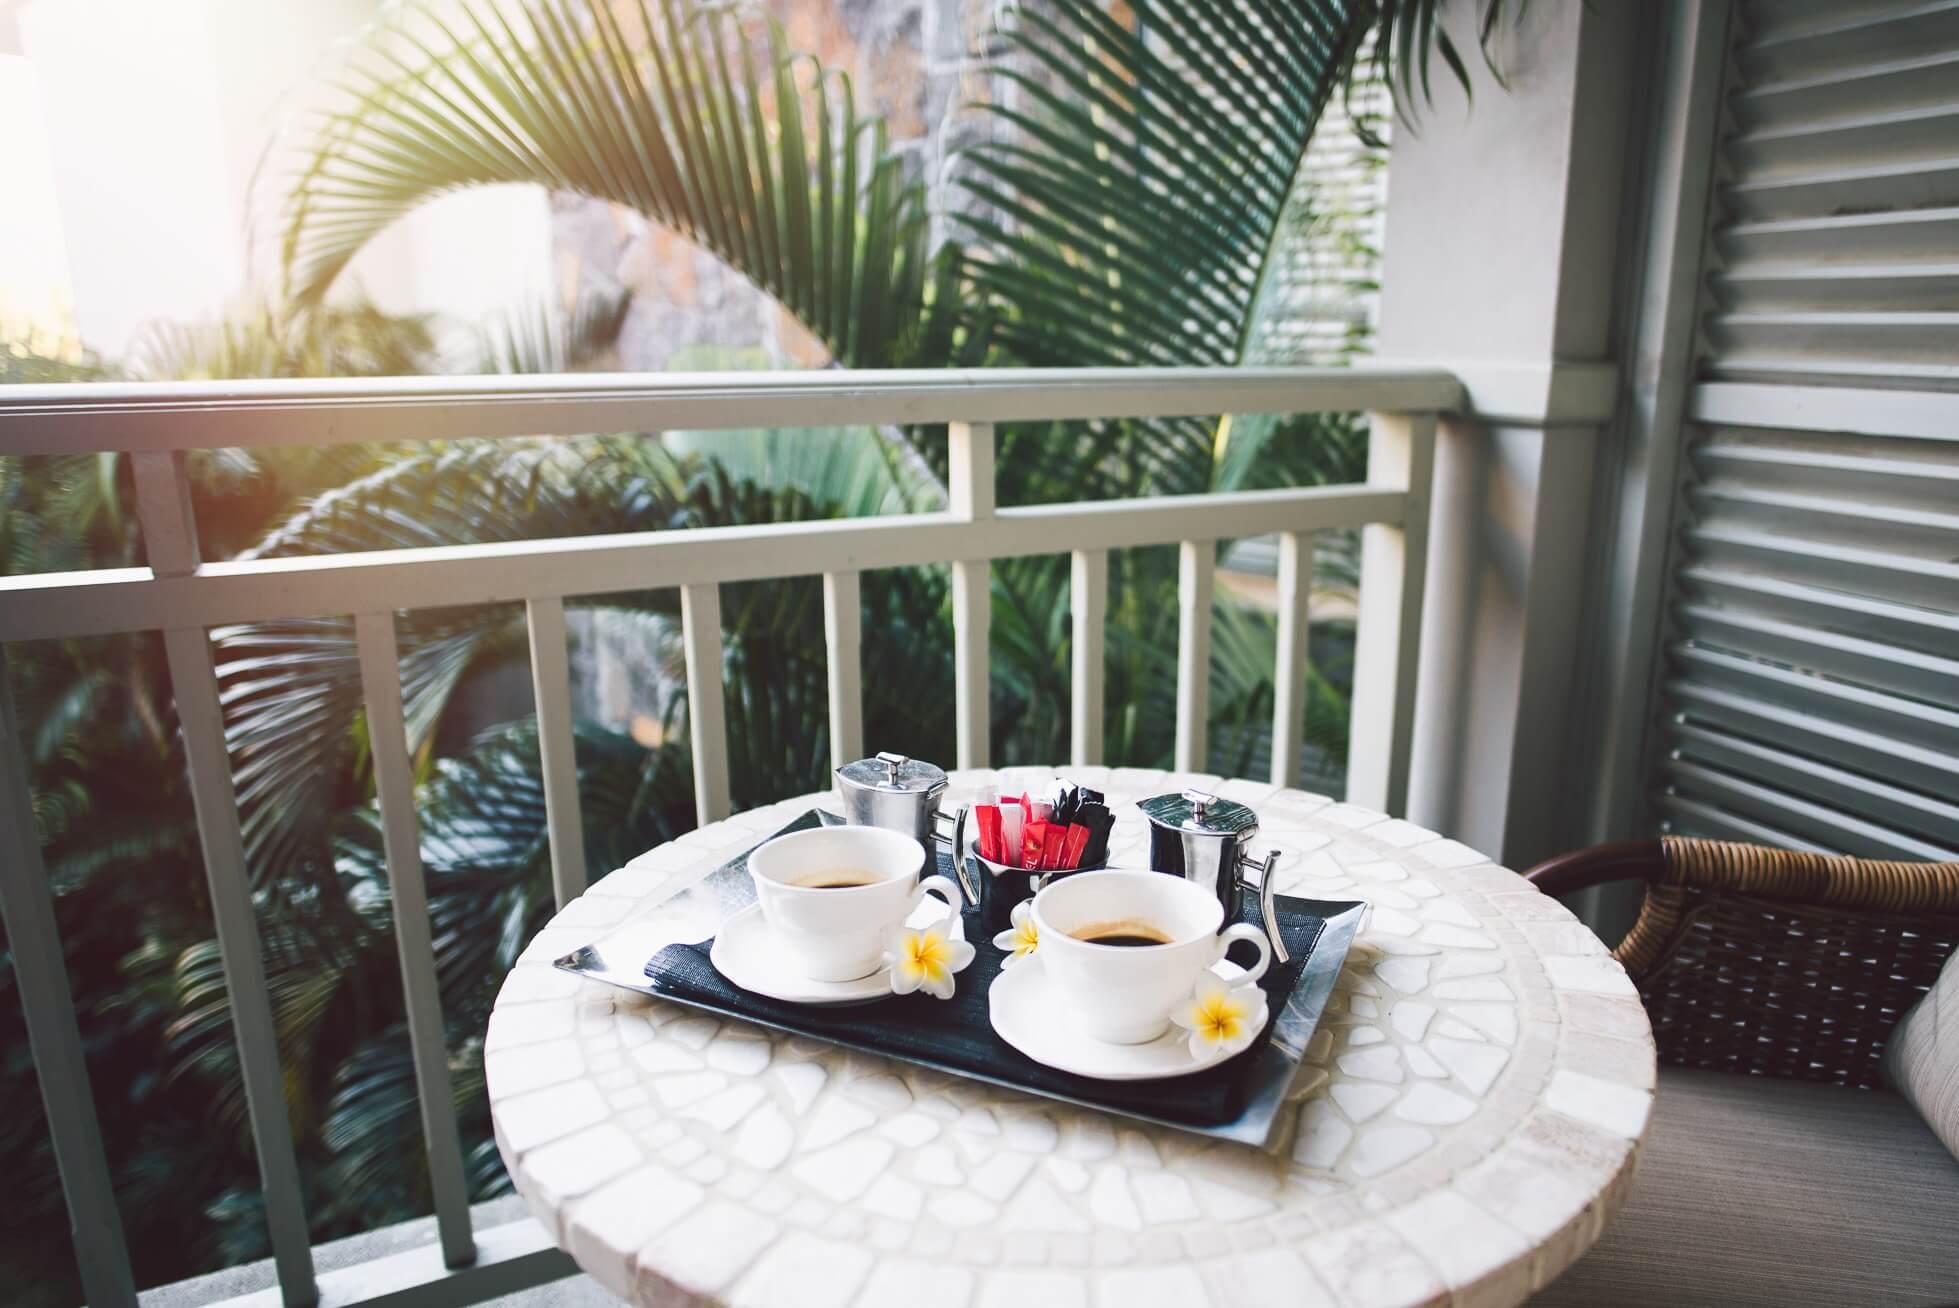 janni-deler-morning-coffeeDSC_3896janni